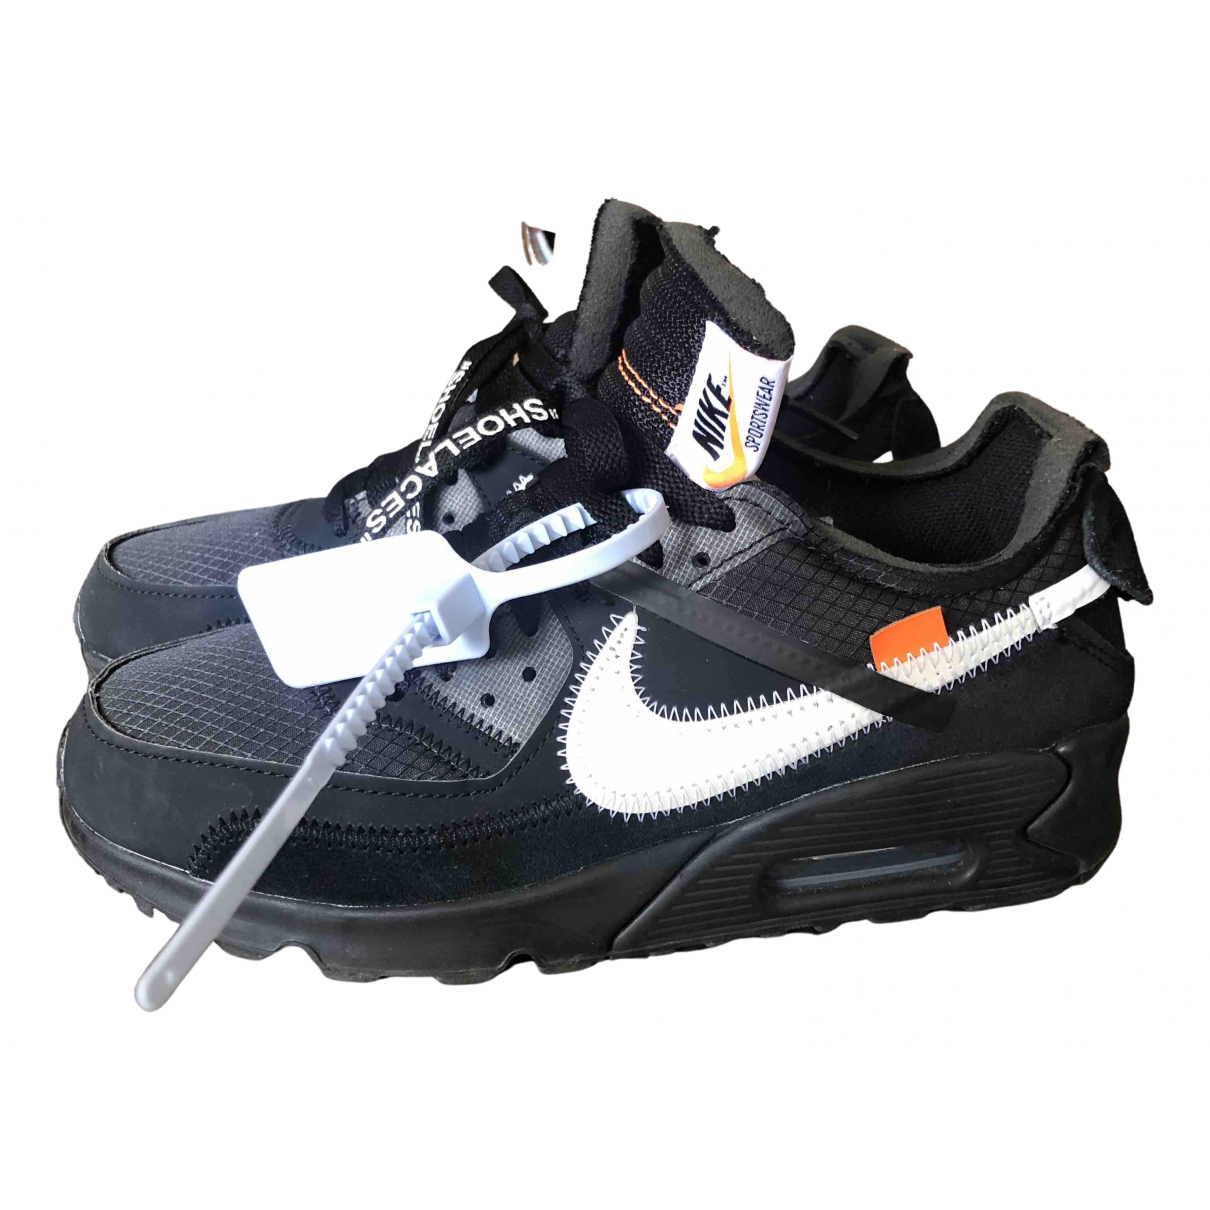 Nike X Off-white Air Max 90 Sneakers in  Schwarz Leinen